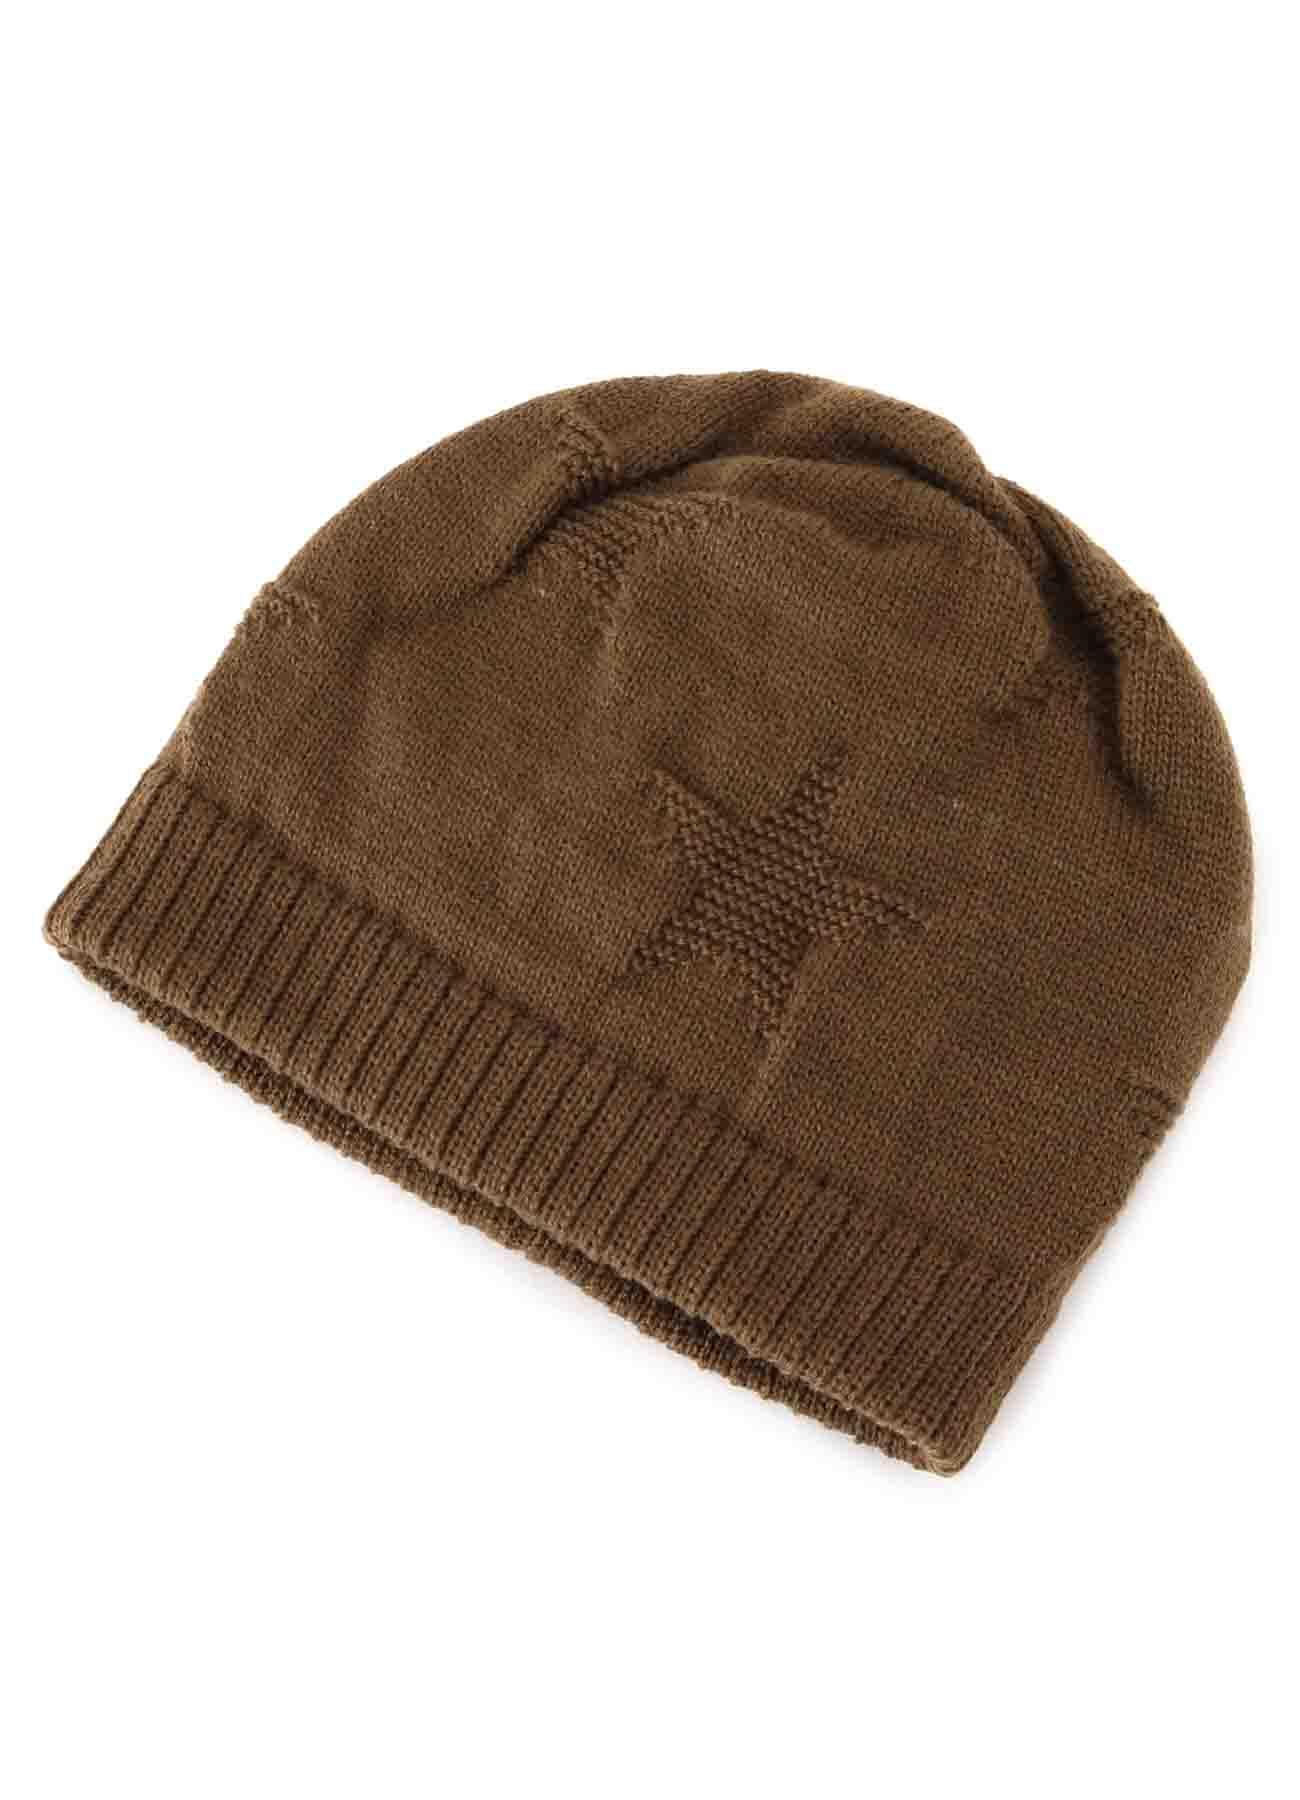 ACRYLIC STAR KNIT CAP